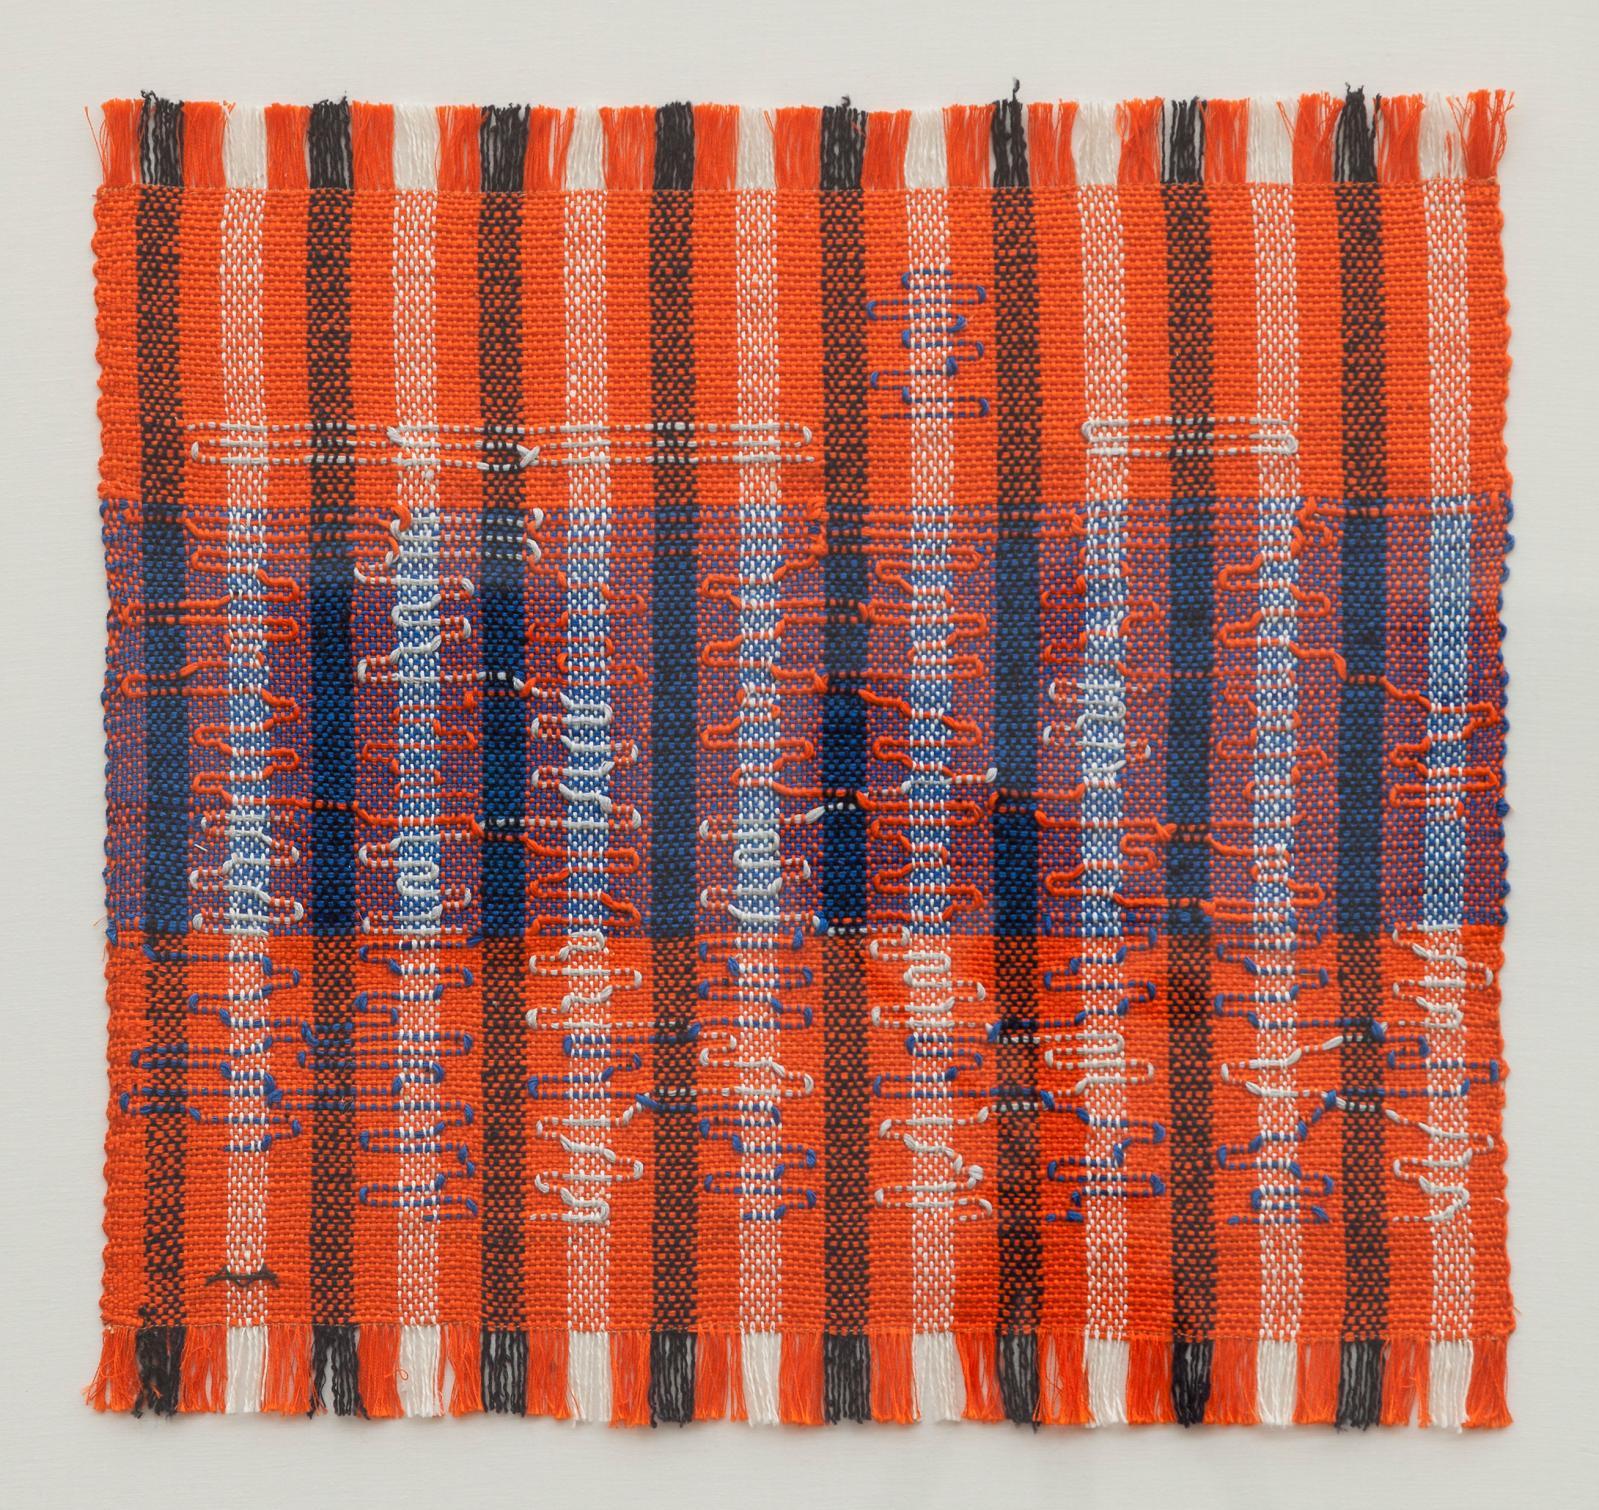 Anni Albers, Intersecting, 1962, coton et rayon, 40x42cm, détail, Josef Albers Museum Quadrat, Bottrop. © 2021 The Josef and Anni Alber